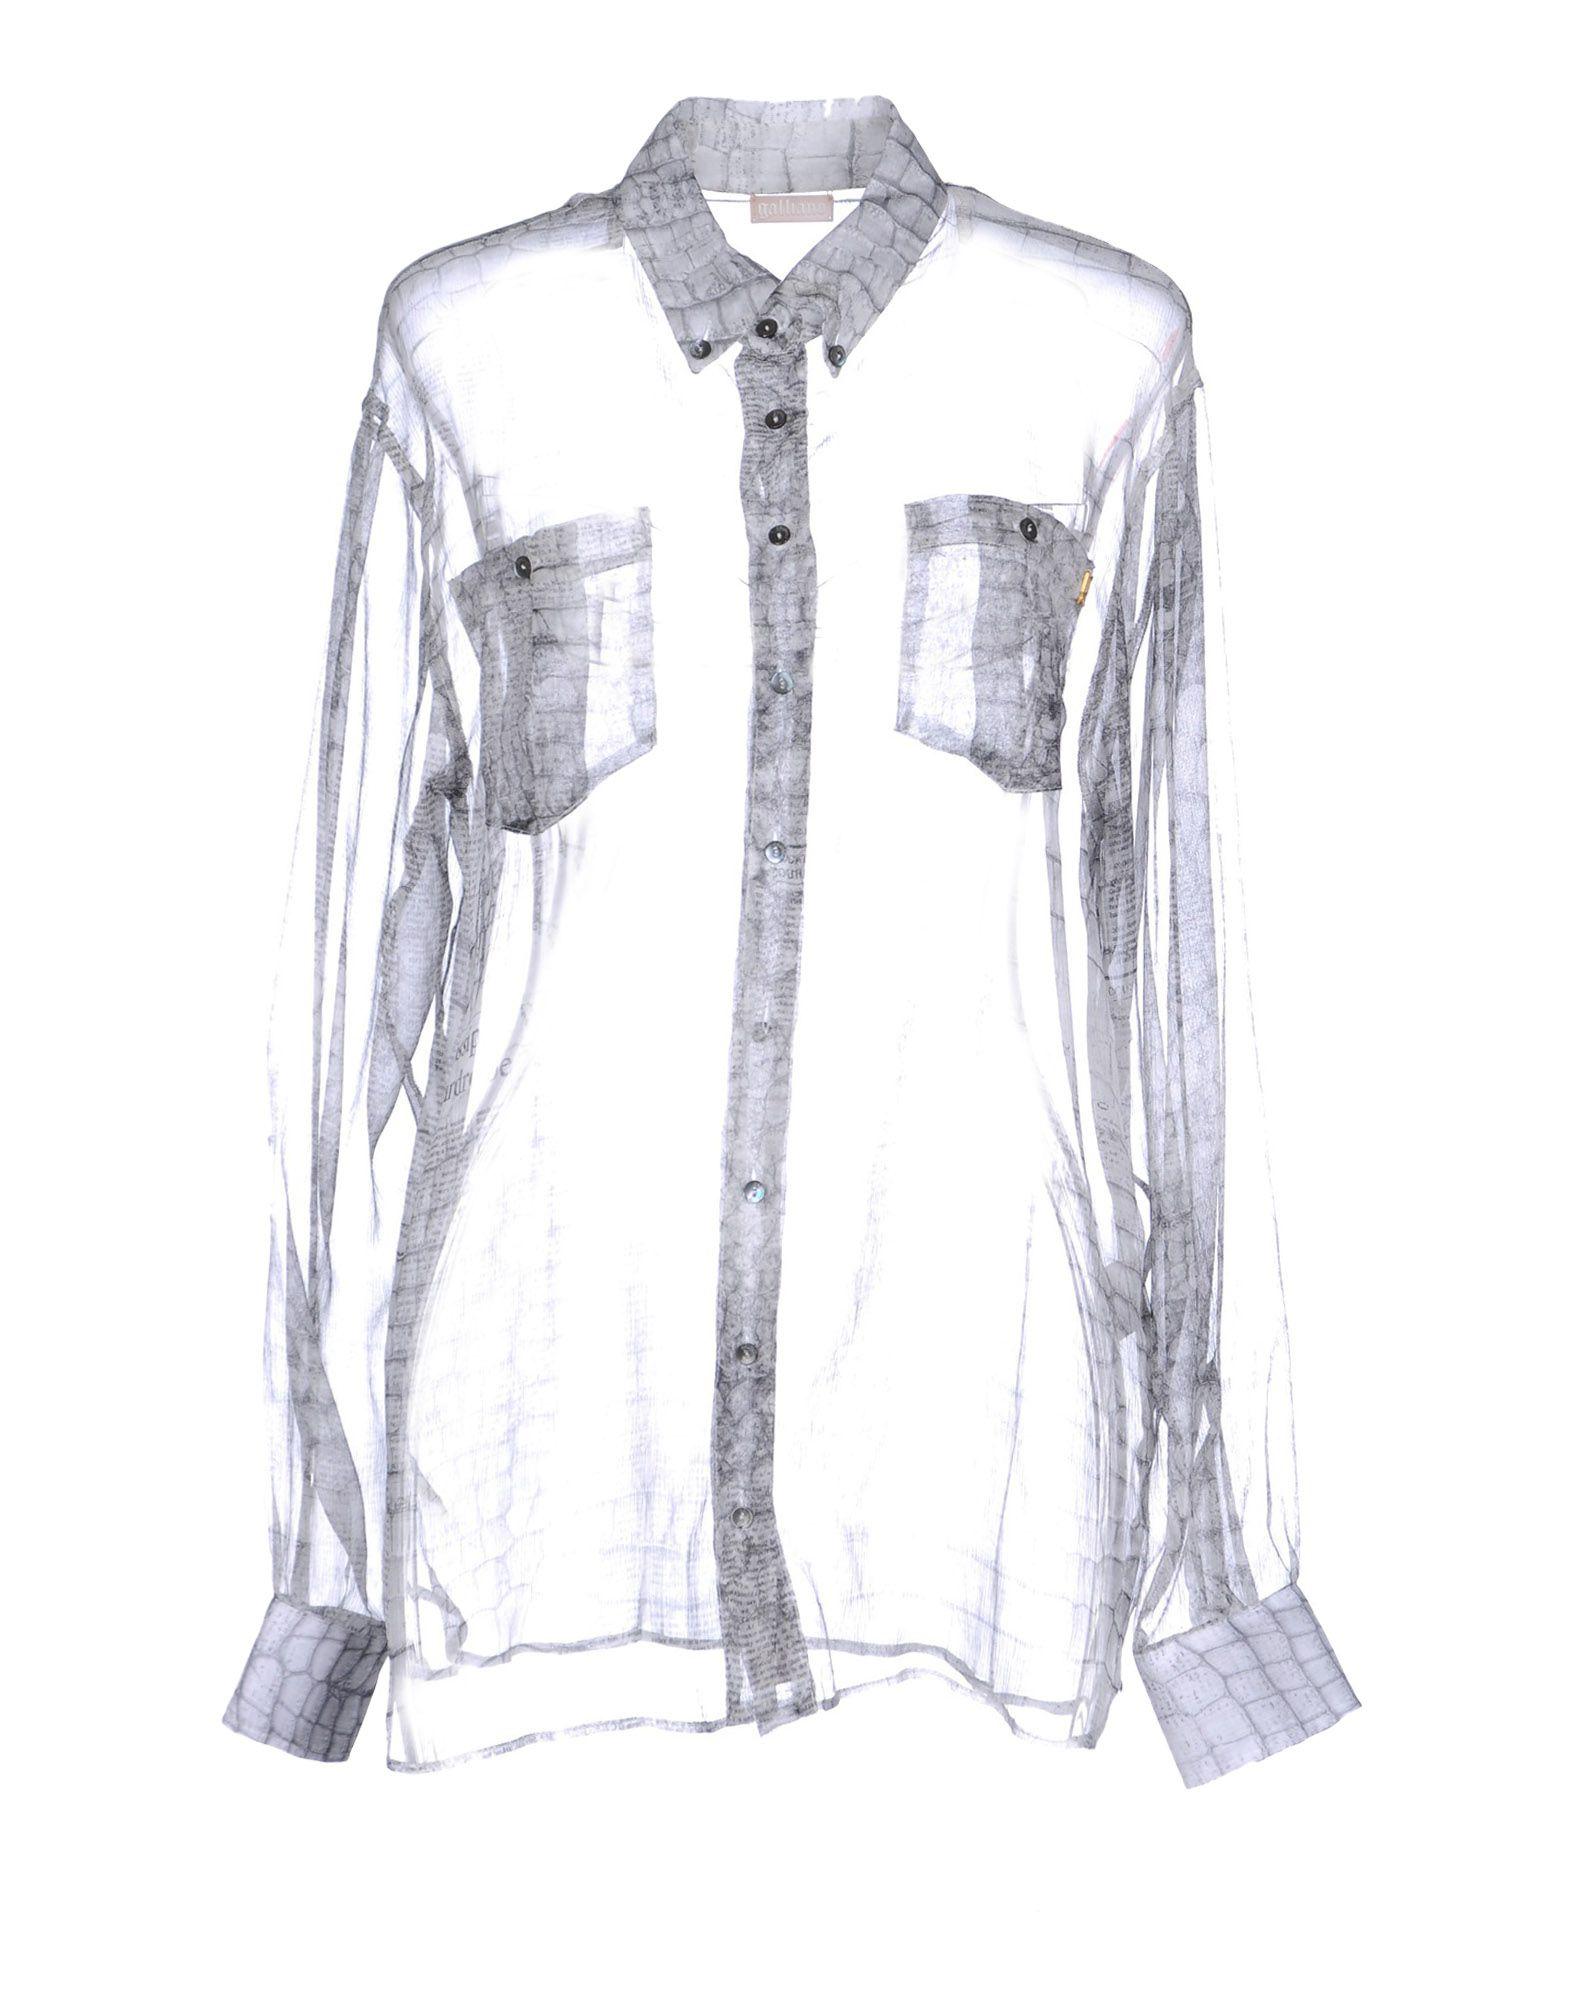 John Galliano Shirt In Gray